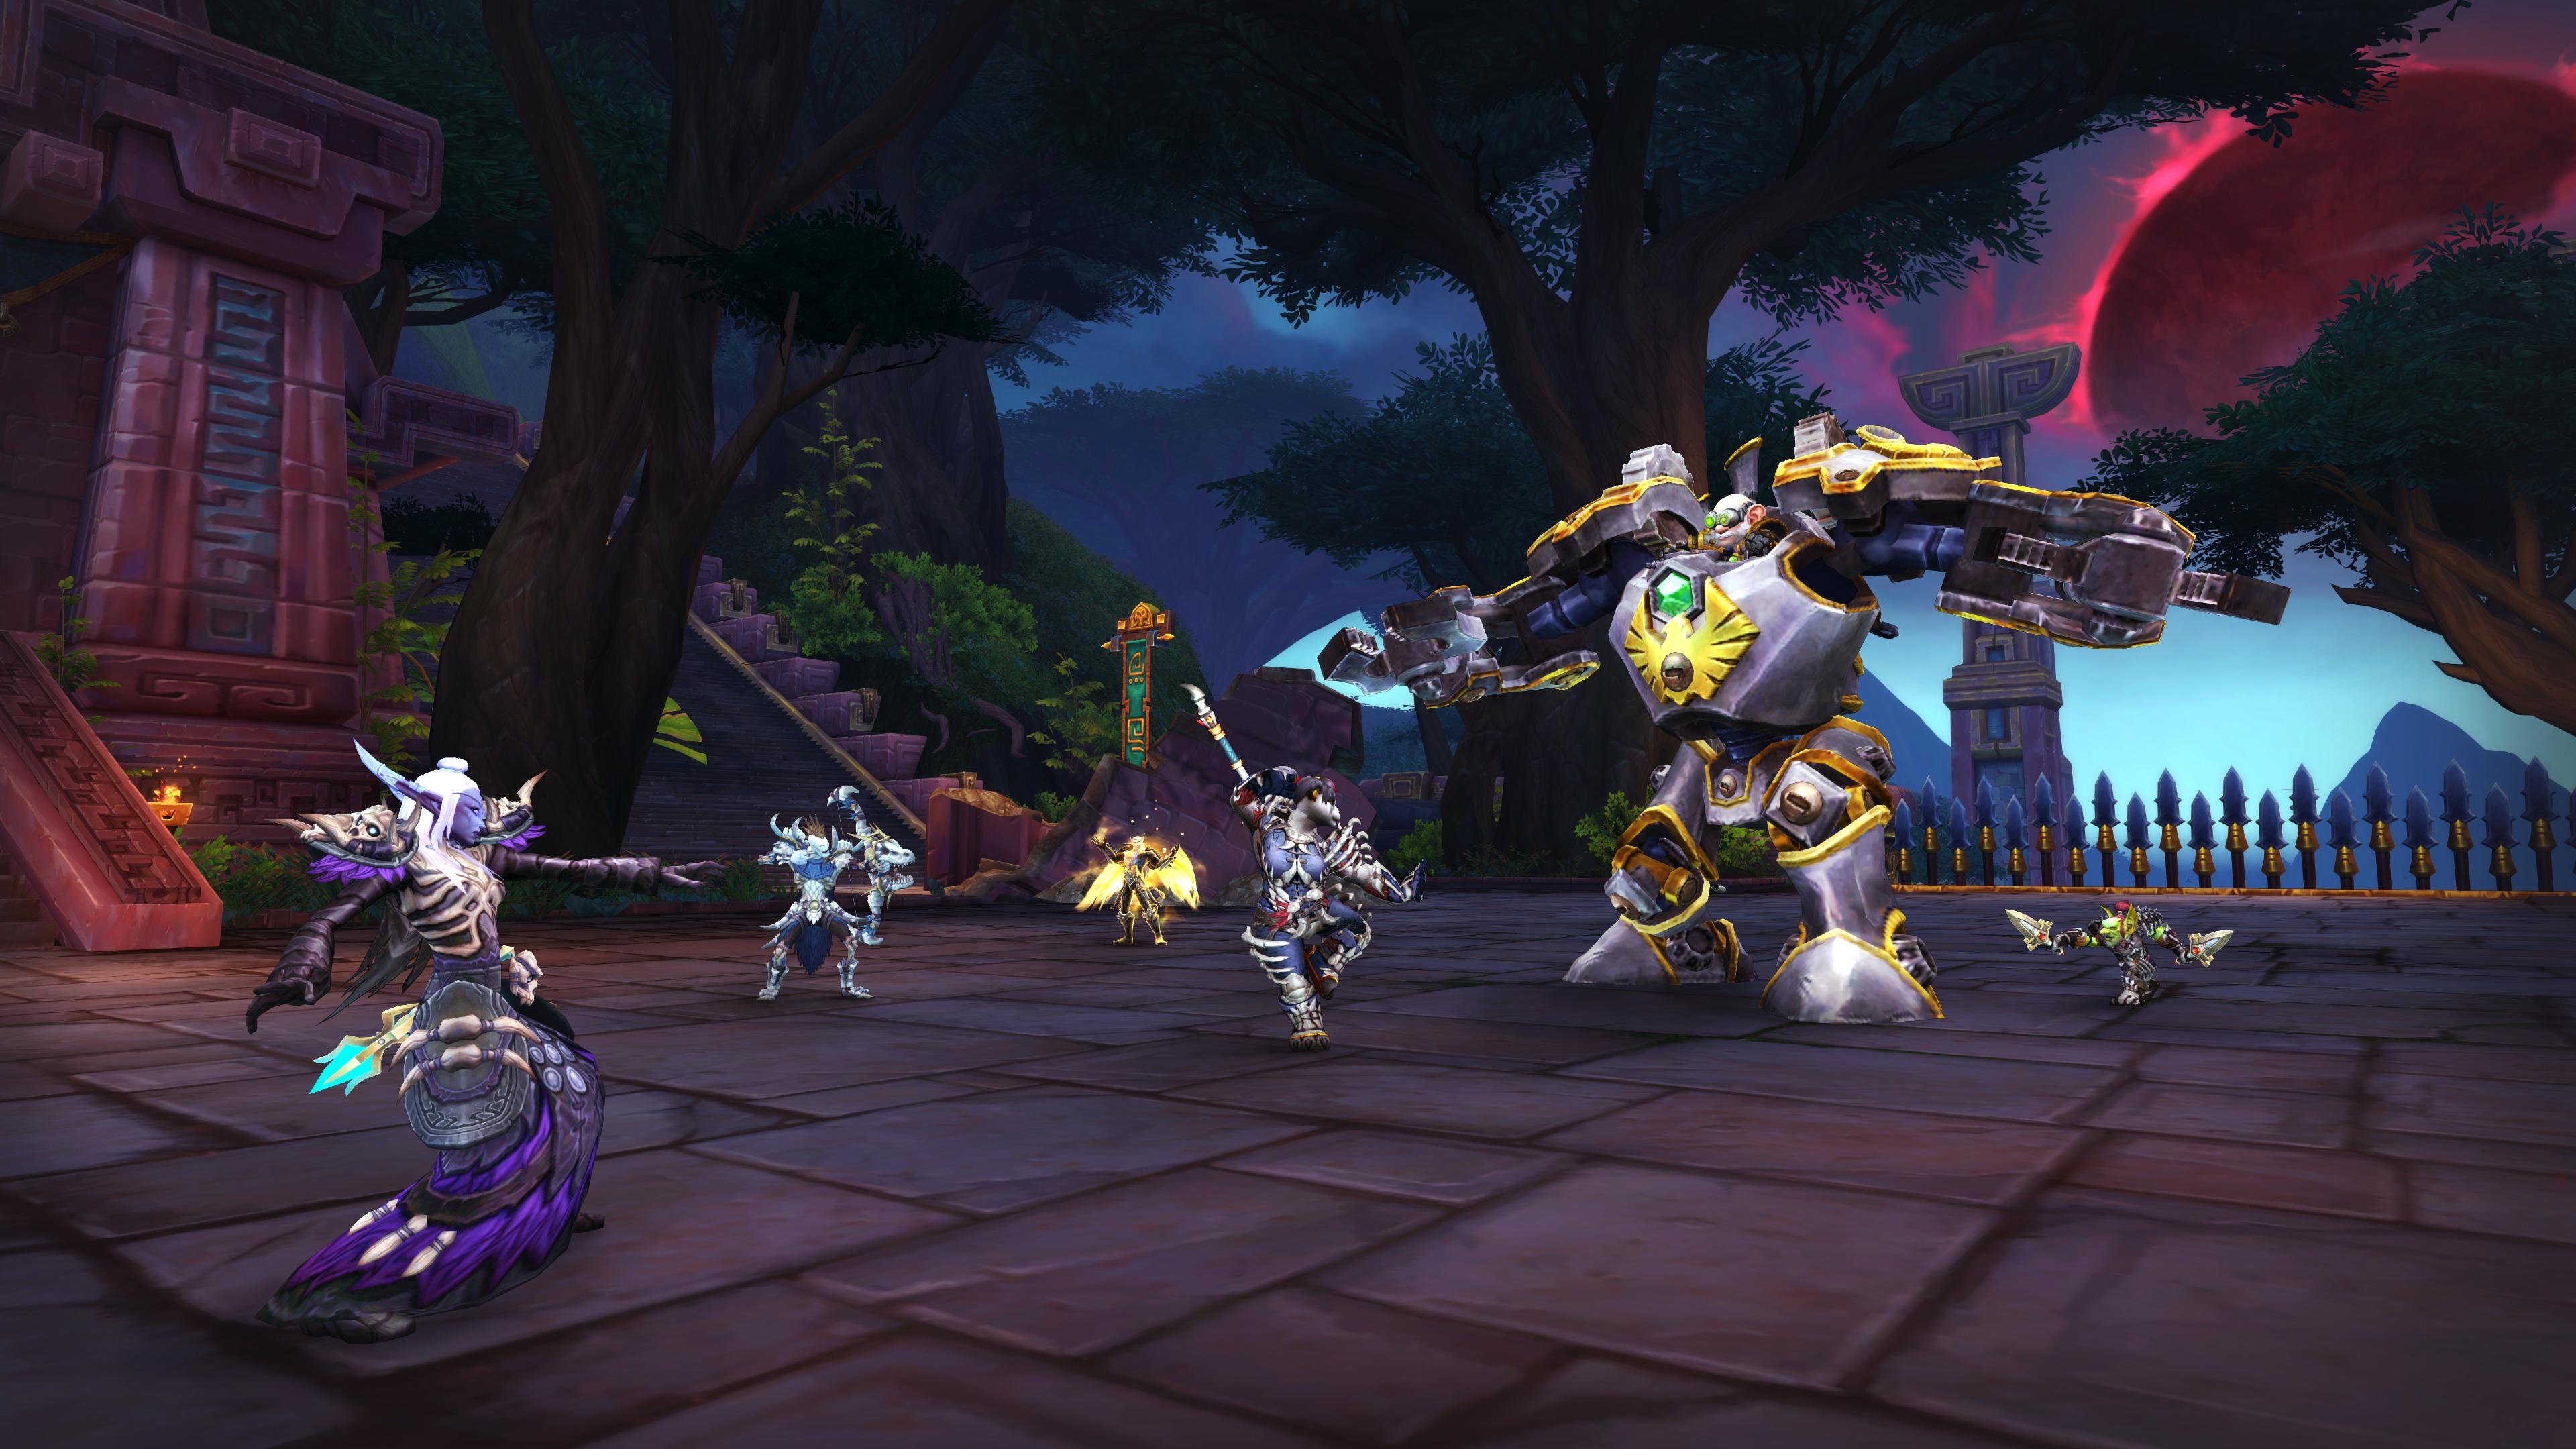 World of Warcraft update brings new raid, new dungeon mechanic